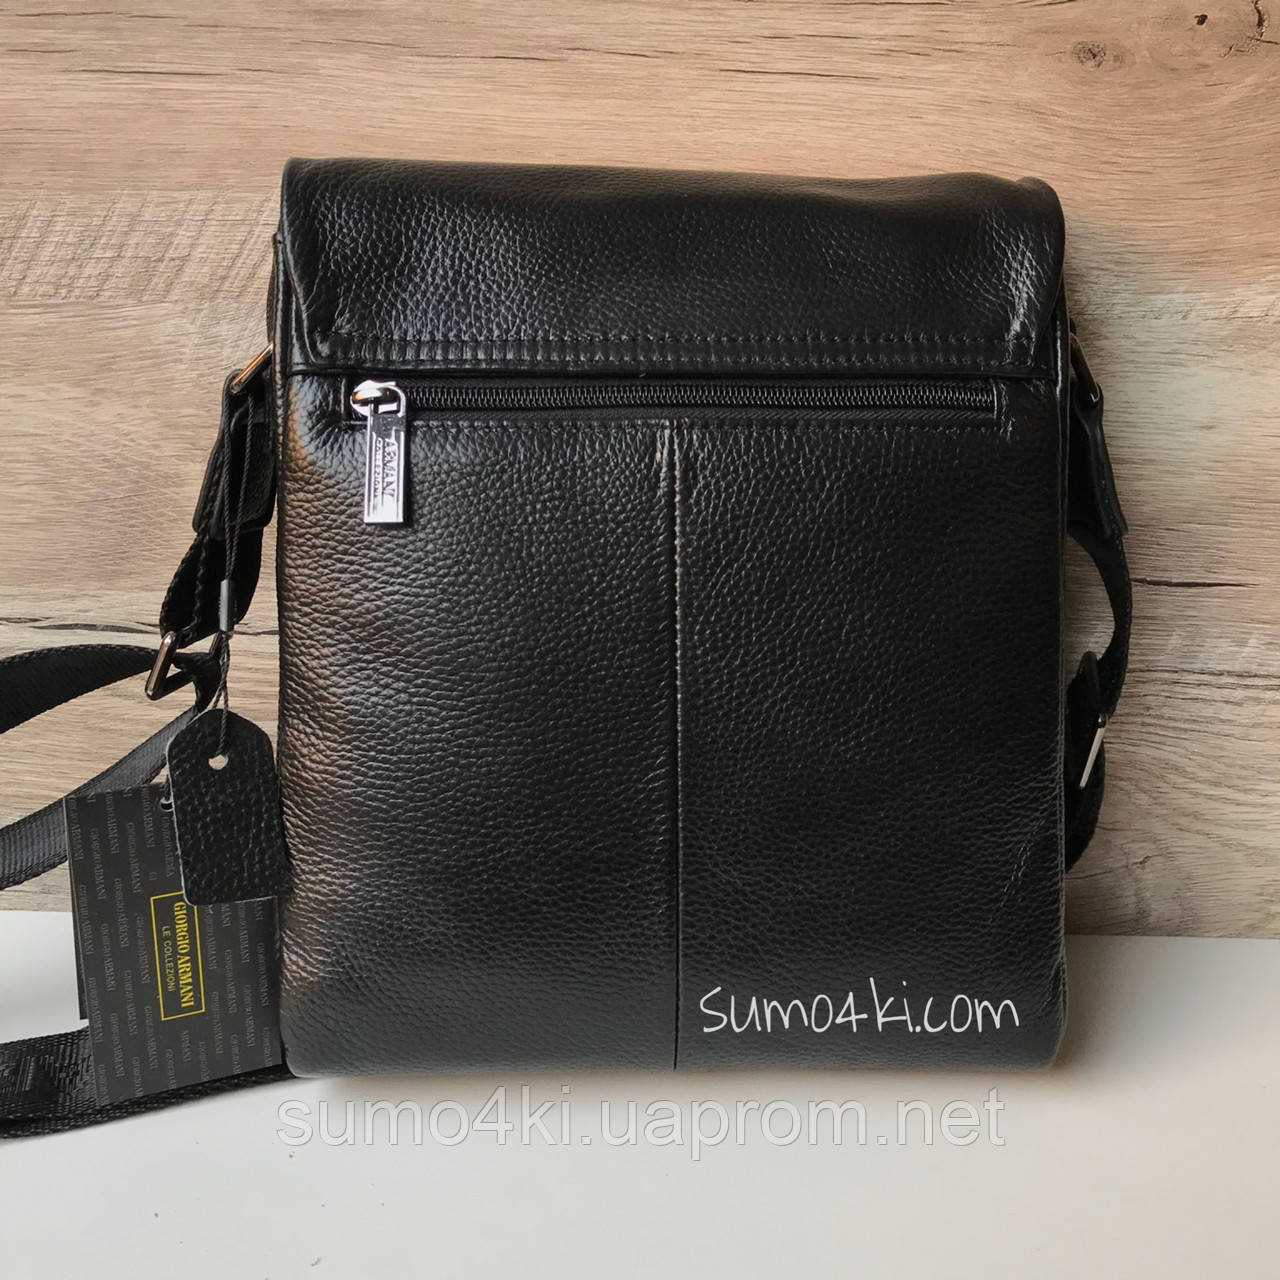 33acb5b0090f Мужская кожаная сумка через плечо Armani Армани, цена 1 550 грн., купить в  Одессе — Prom.ua (ID#628261134)